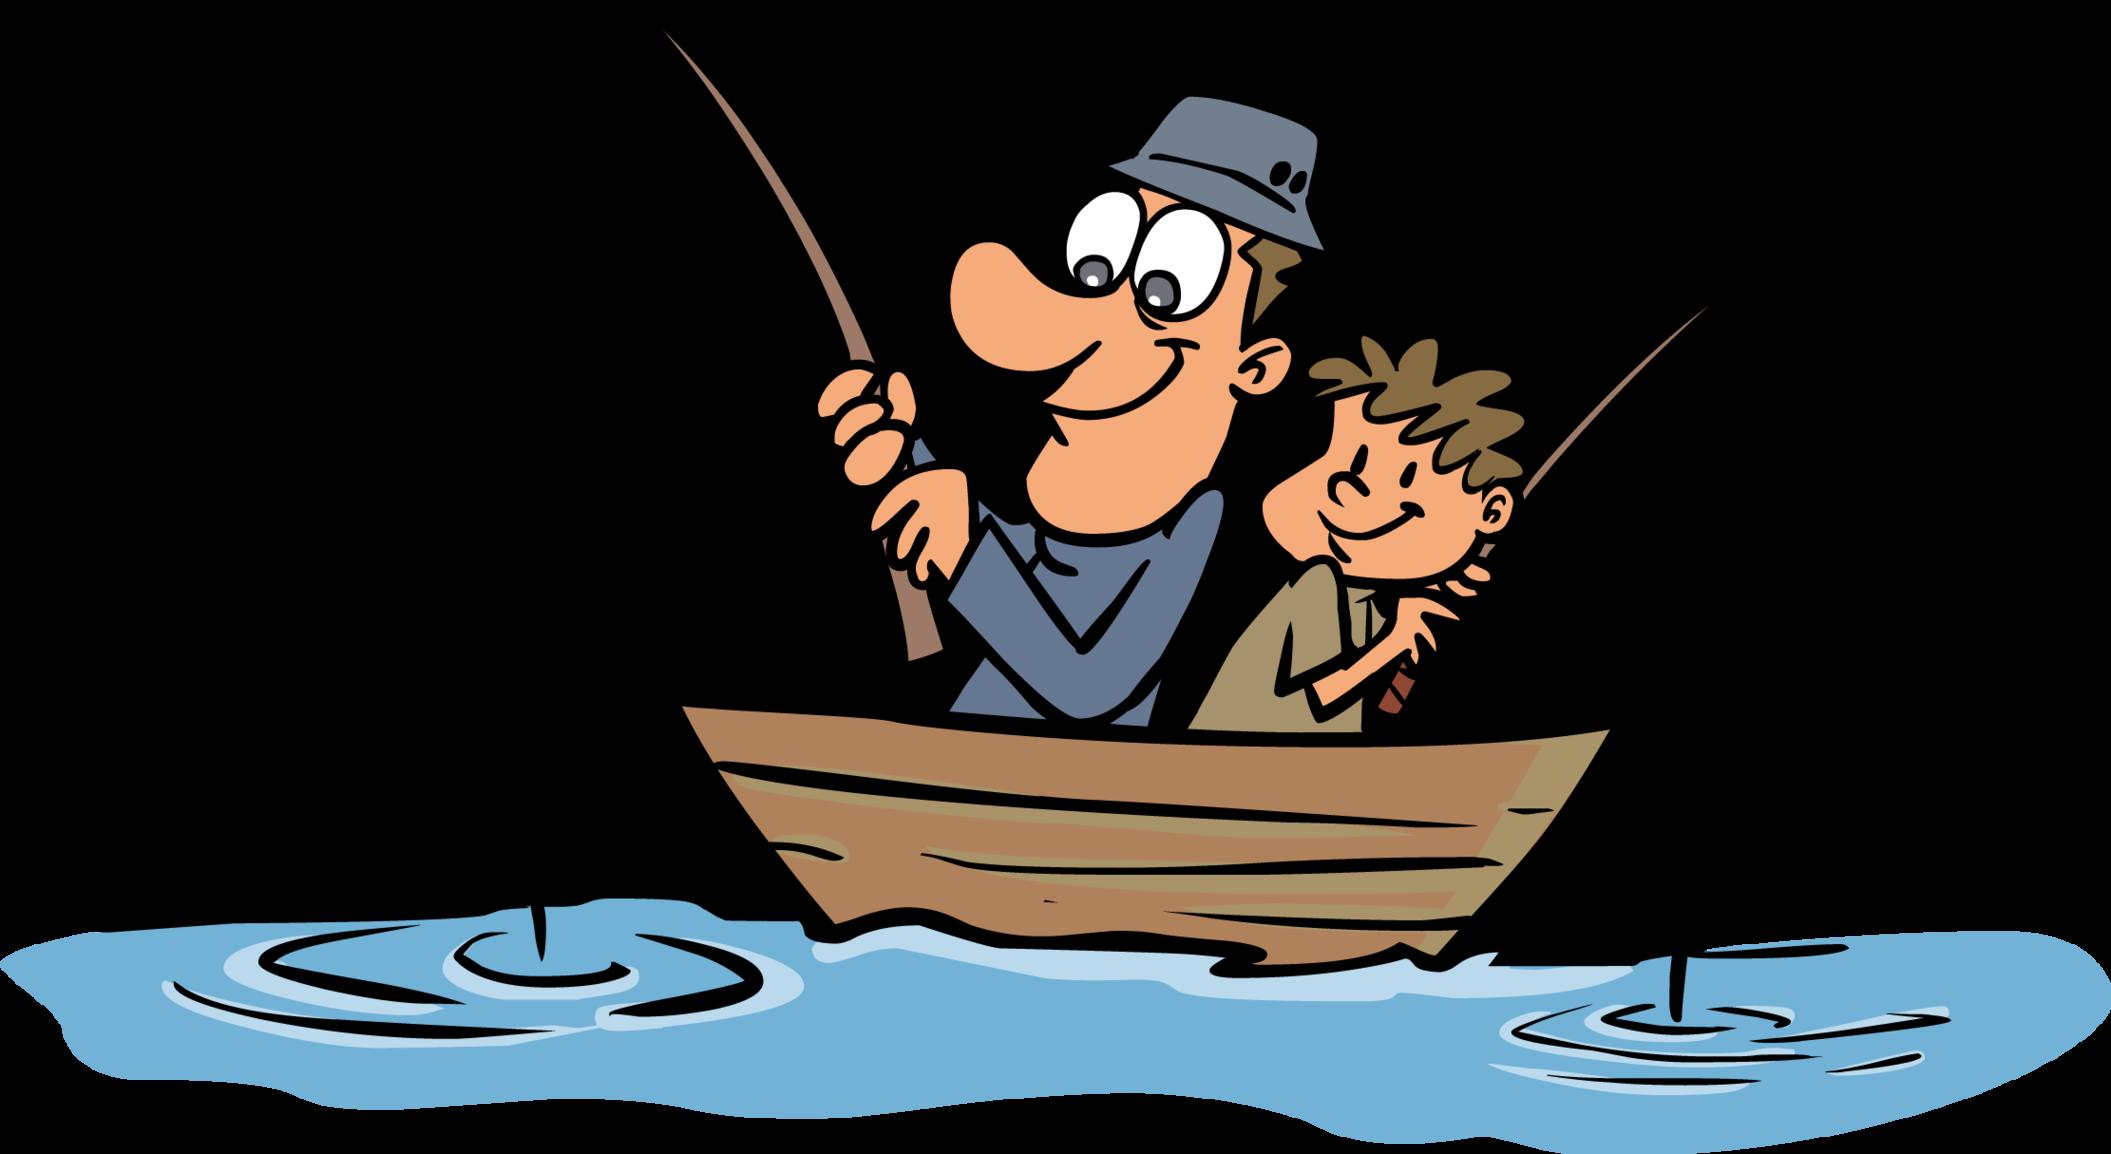 Fish clip art cart. Fisherman clipart fishing vest